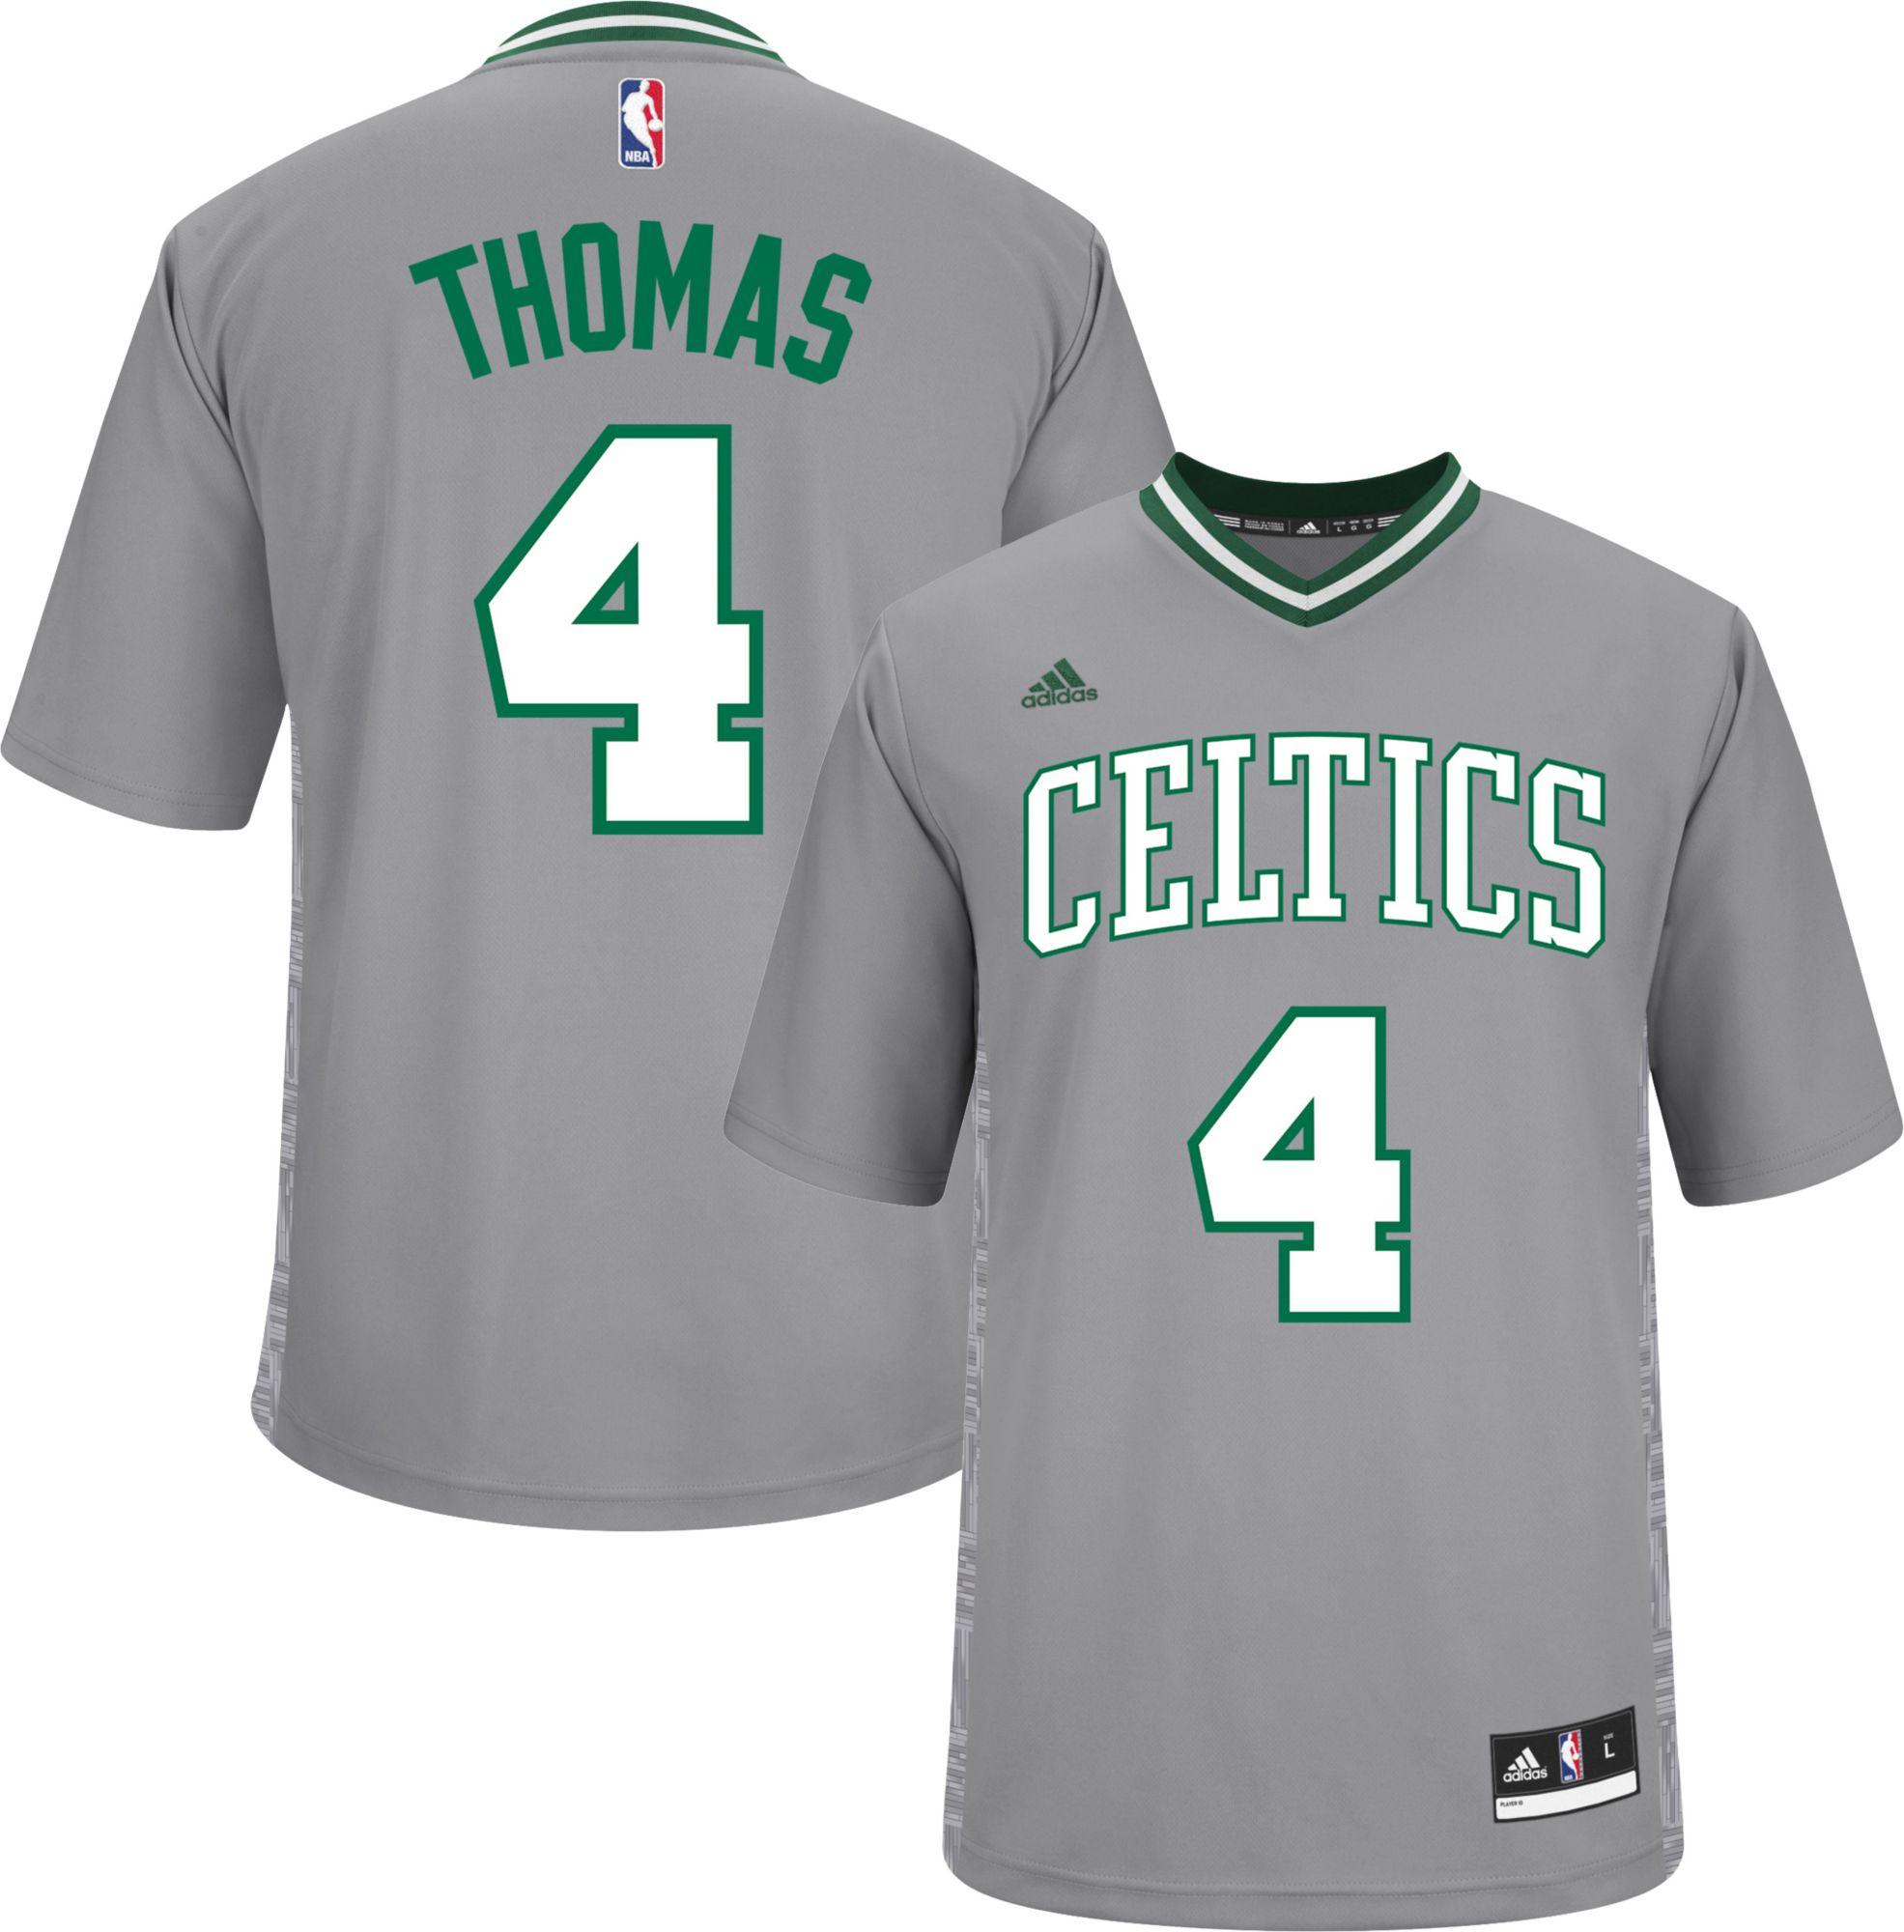 buy popular 82d06 4b9c8 isaiah thomas jersey cheap